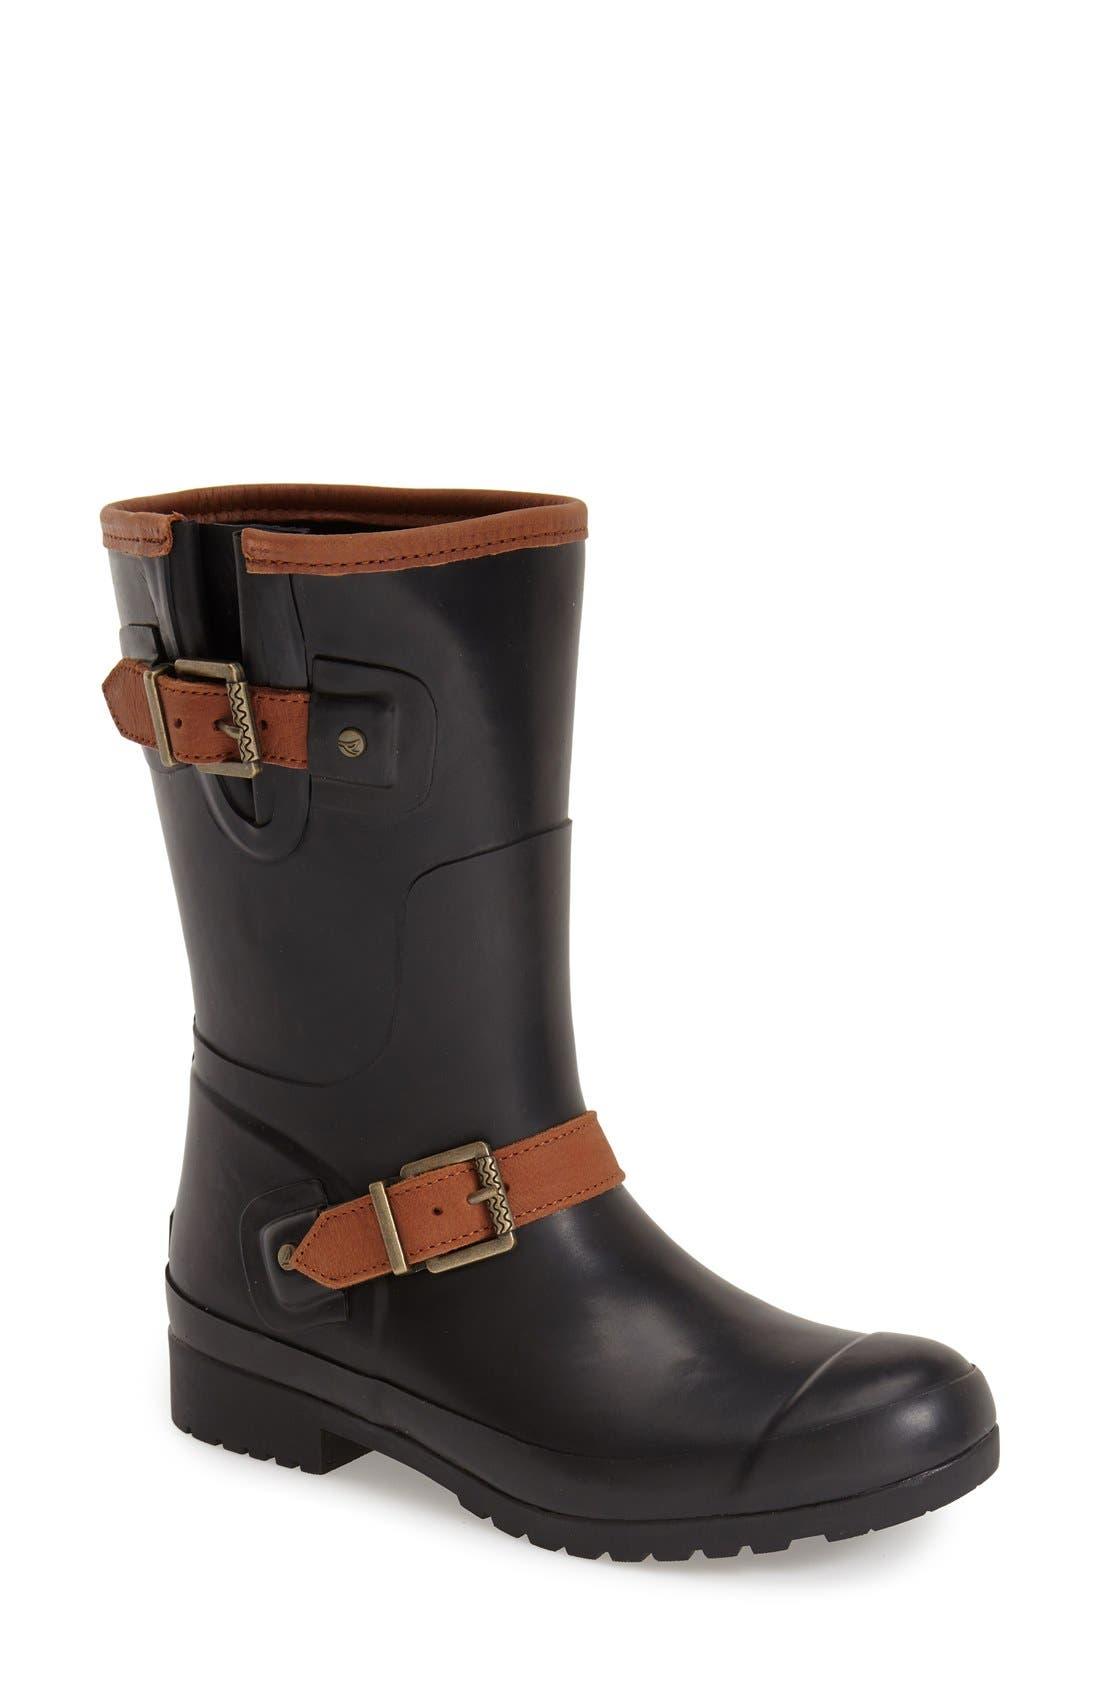 Alternate Image 1 Selected - Sperry 'Walker Fog' WaterproofRain Boot (Women)